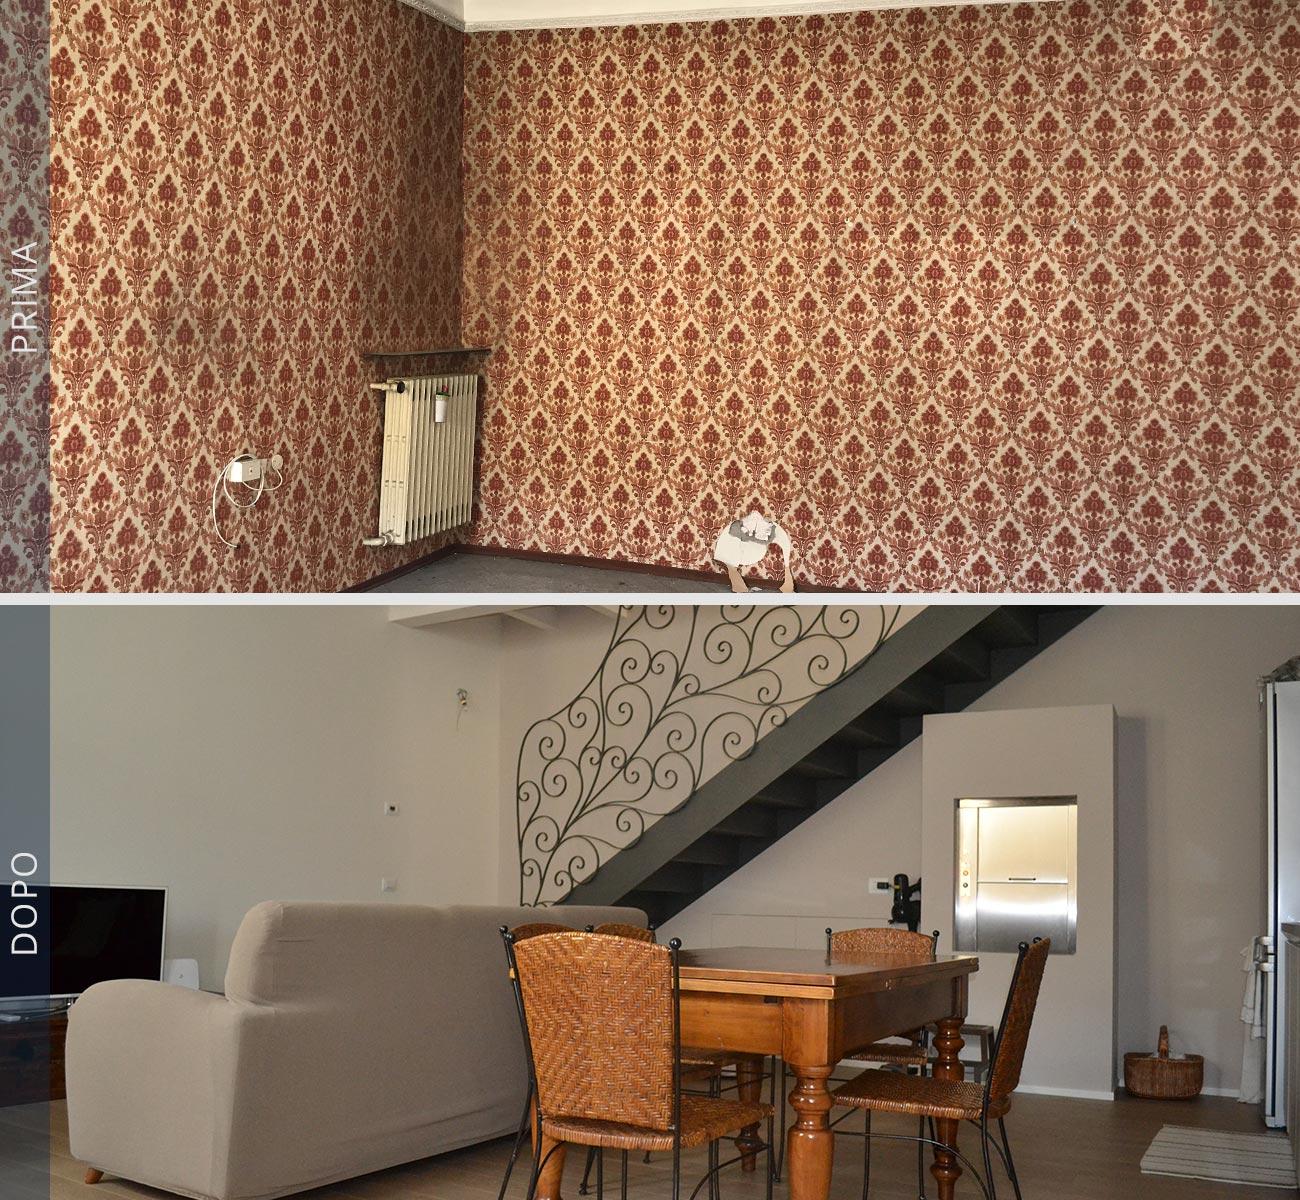 residenziale-ravenna_studio-tb-01